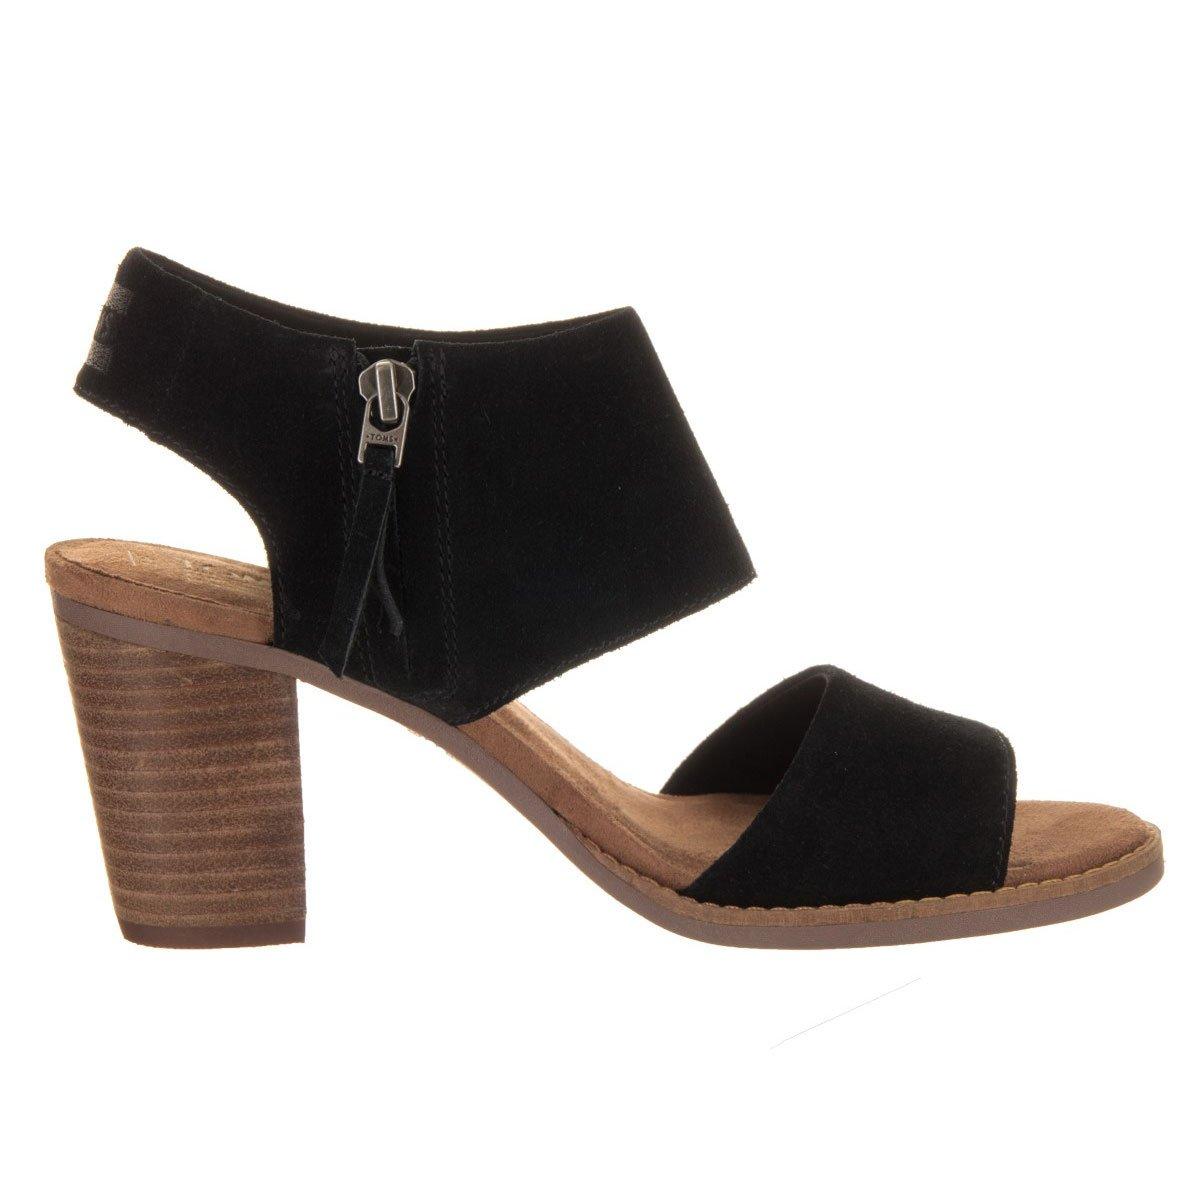 Toms Women's Majorca Cutout Sandal - Black, 8 B(M) US